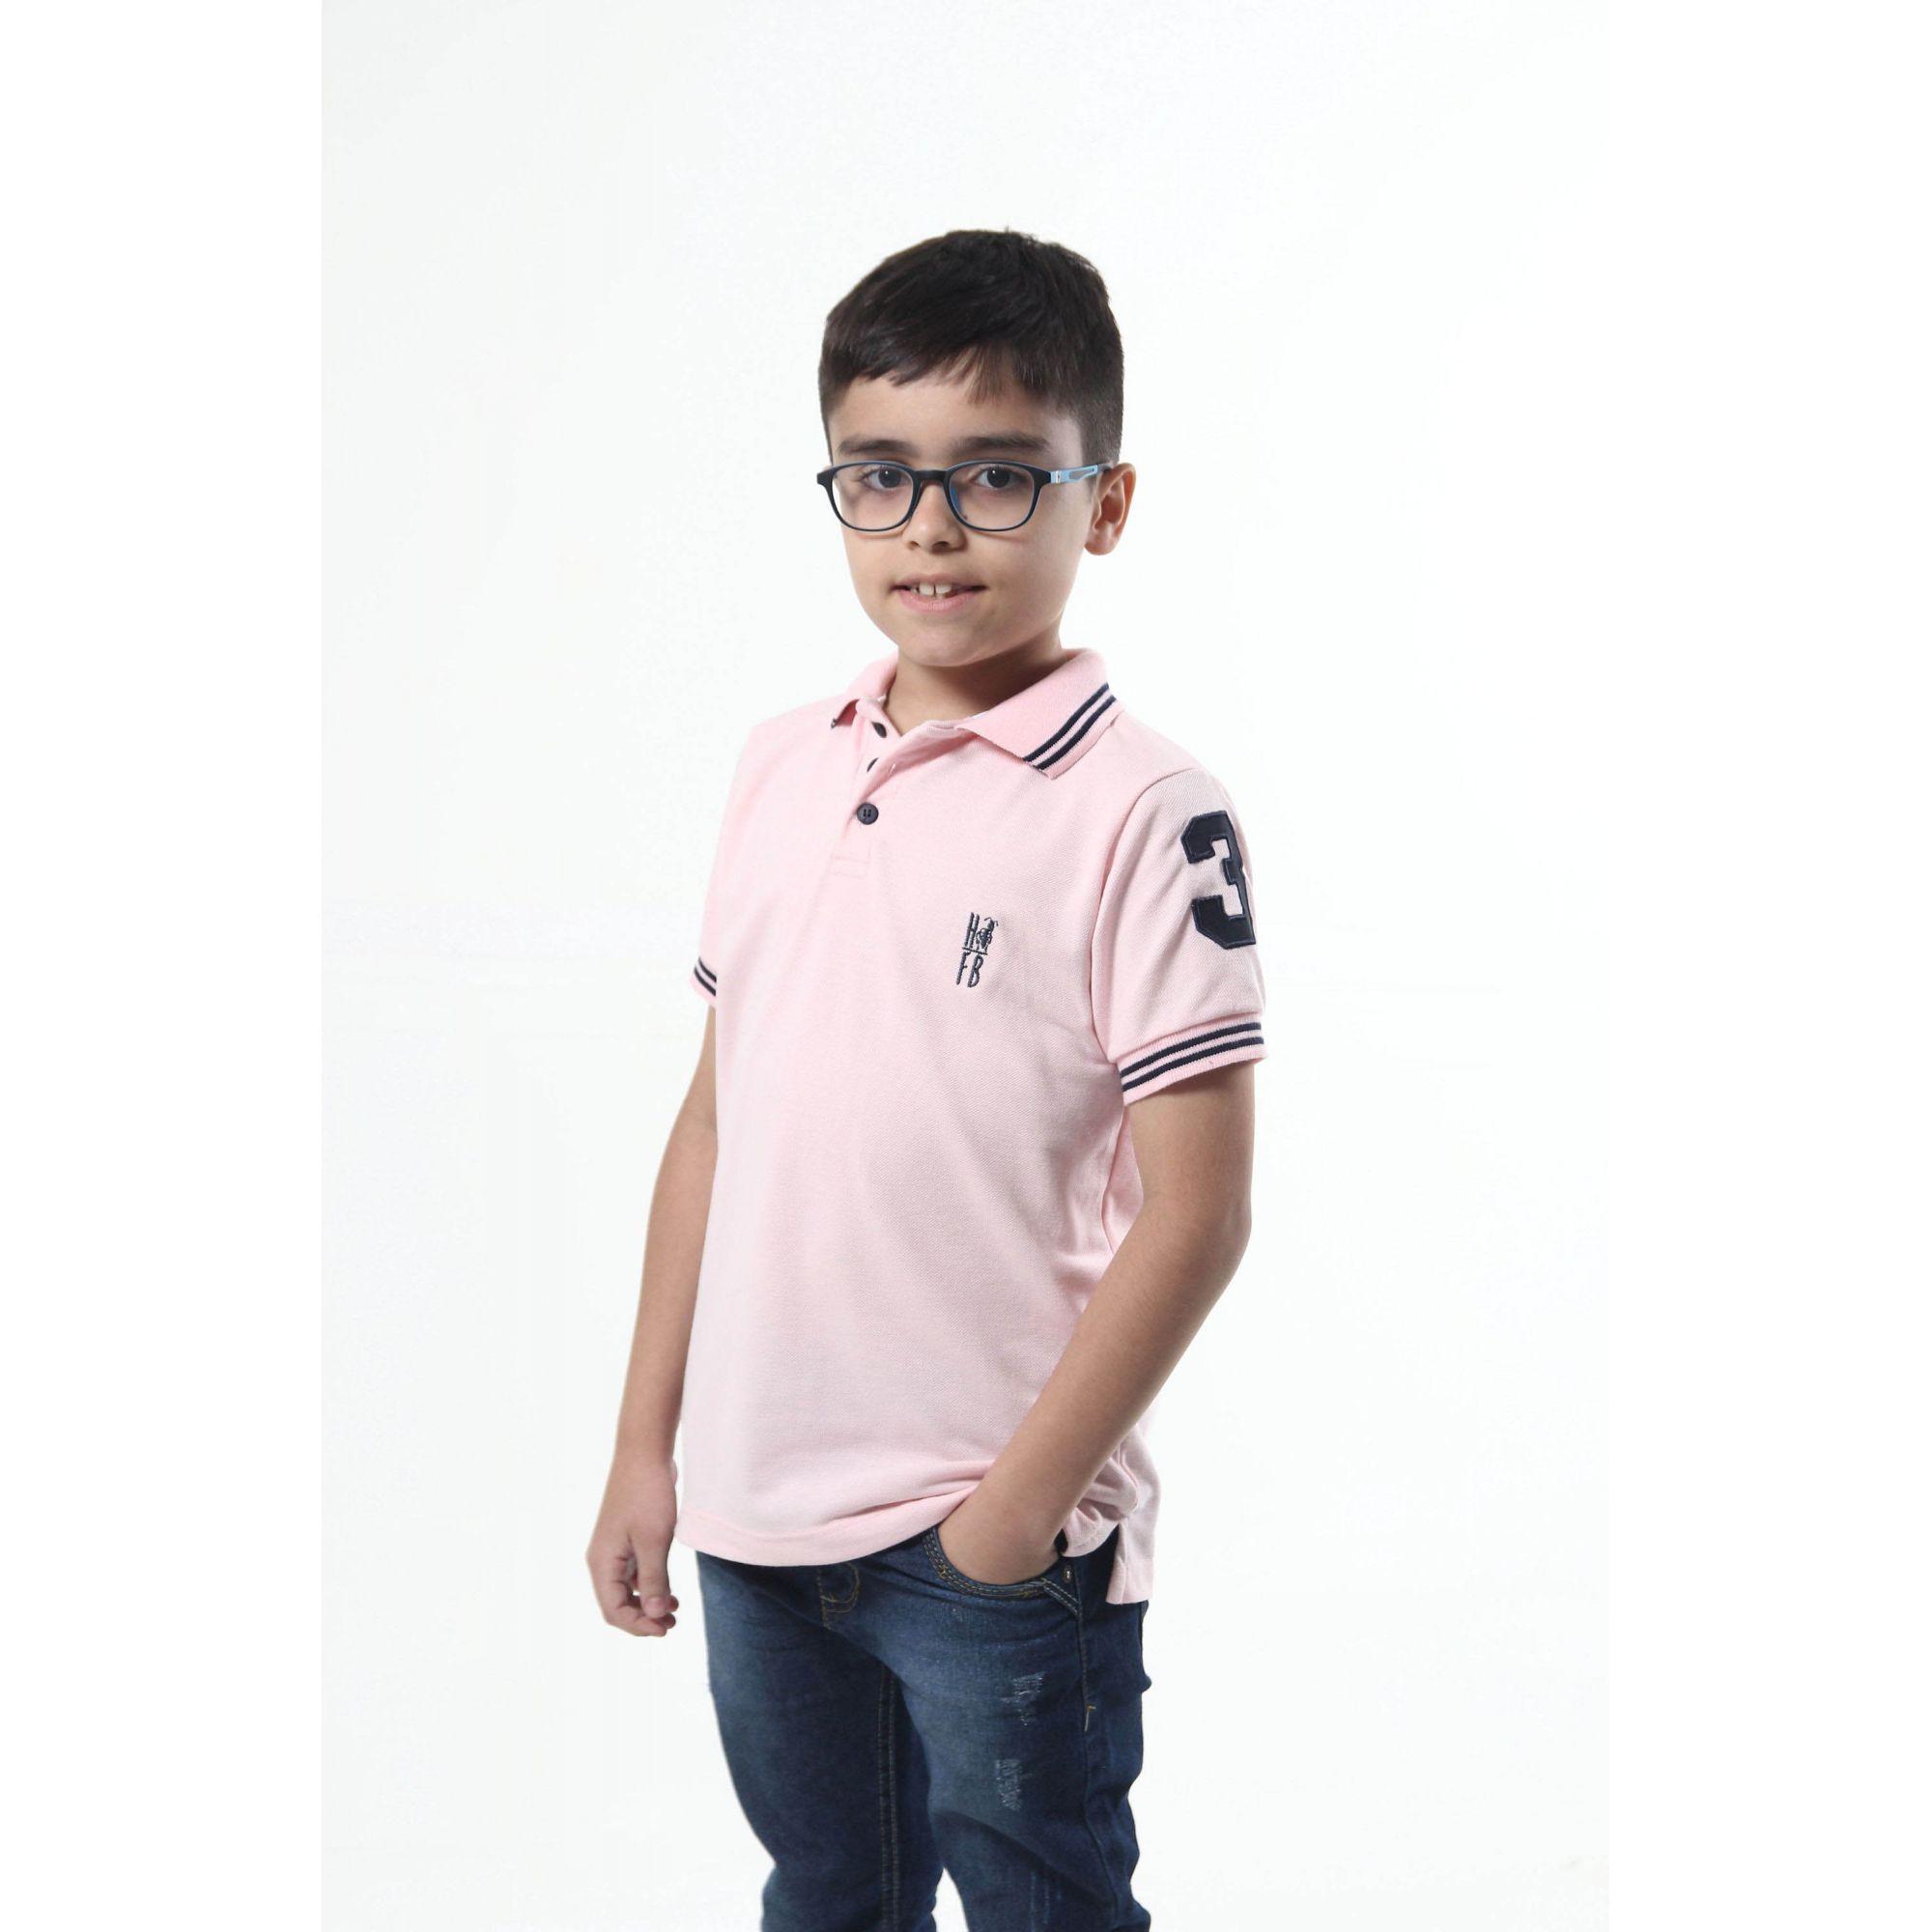 MÃE E FILHO > Kit 02 peças Vestido e Camisa Polo Infantil Rosa Amor [Coleção Tal Mãe Tal Filho]  - Heitor Fashion Brazil